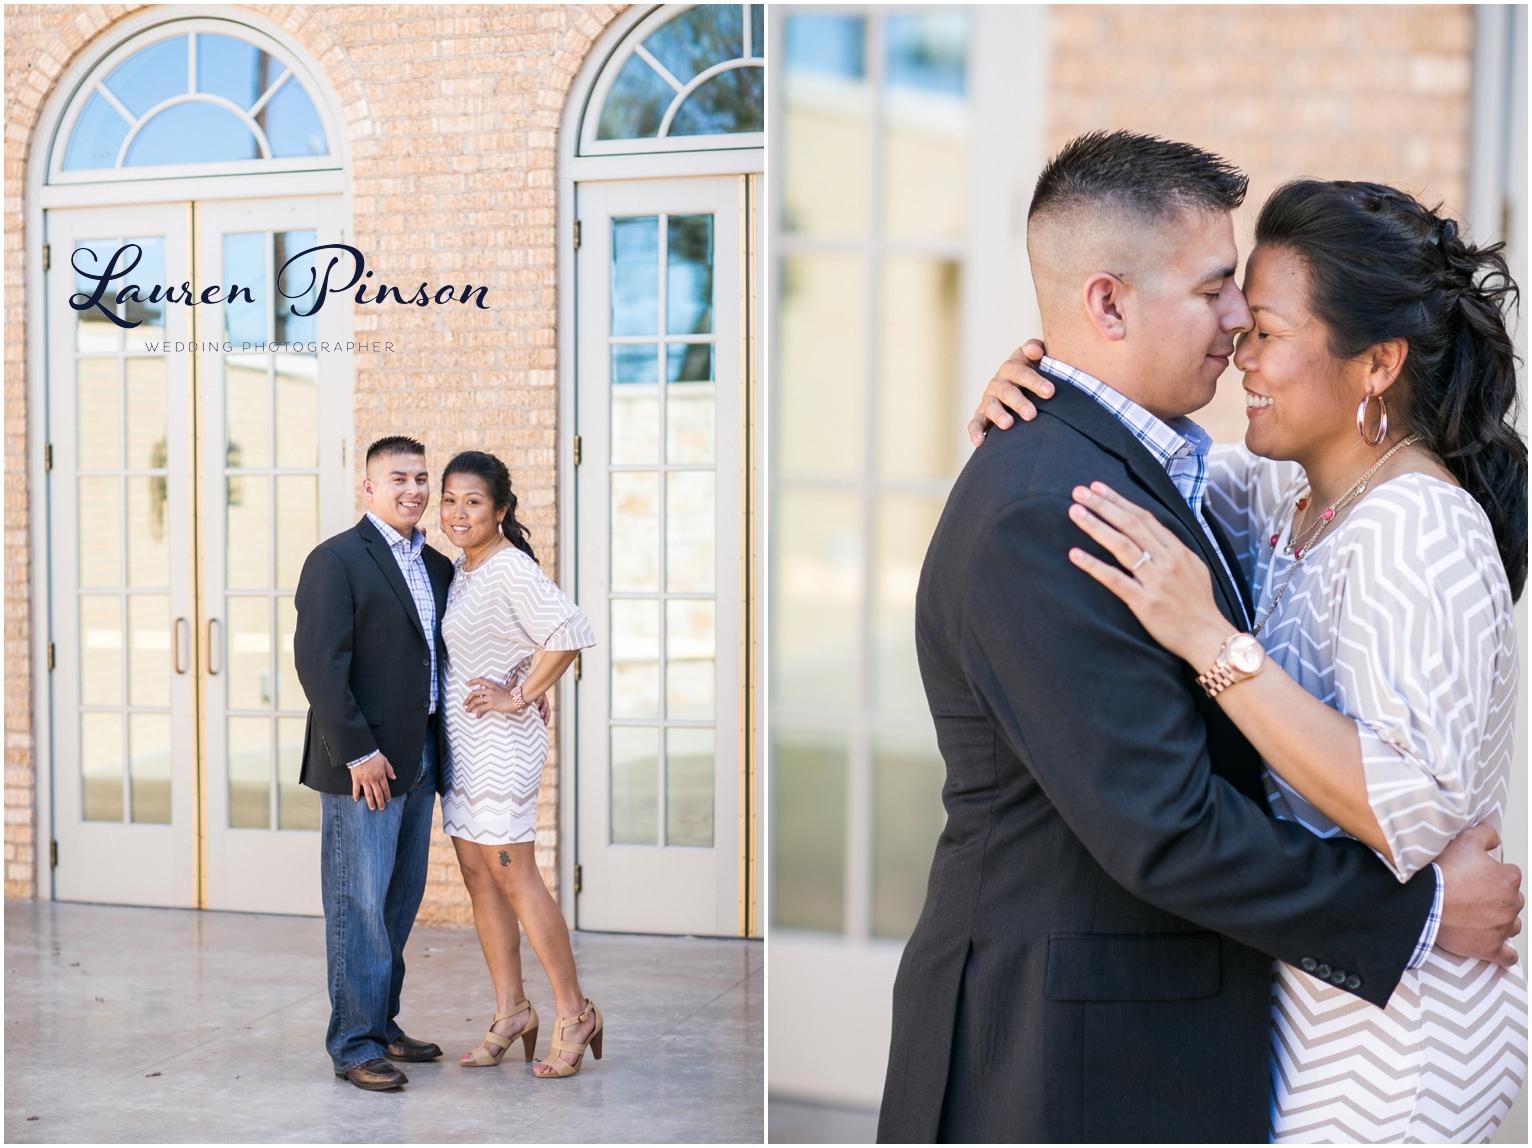 wichita-falls-wedding-photographer-engagement-session-texas-photography-oklahoma-engagement-wedding-photography_0602.jpg